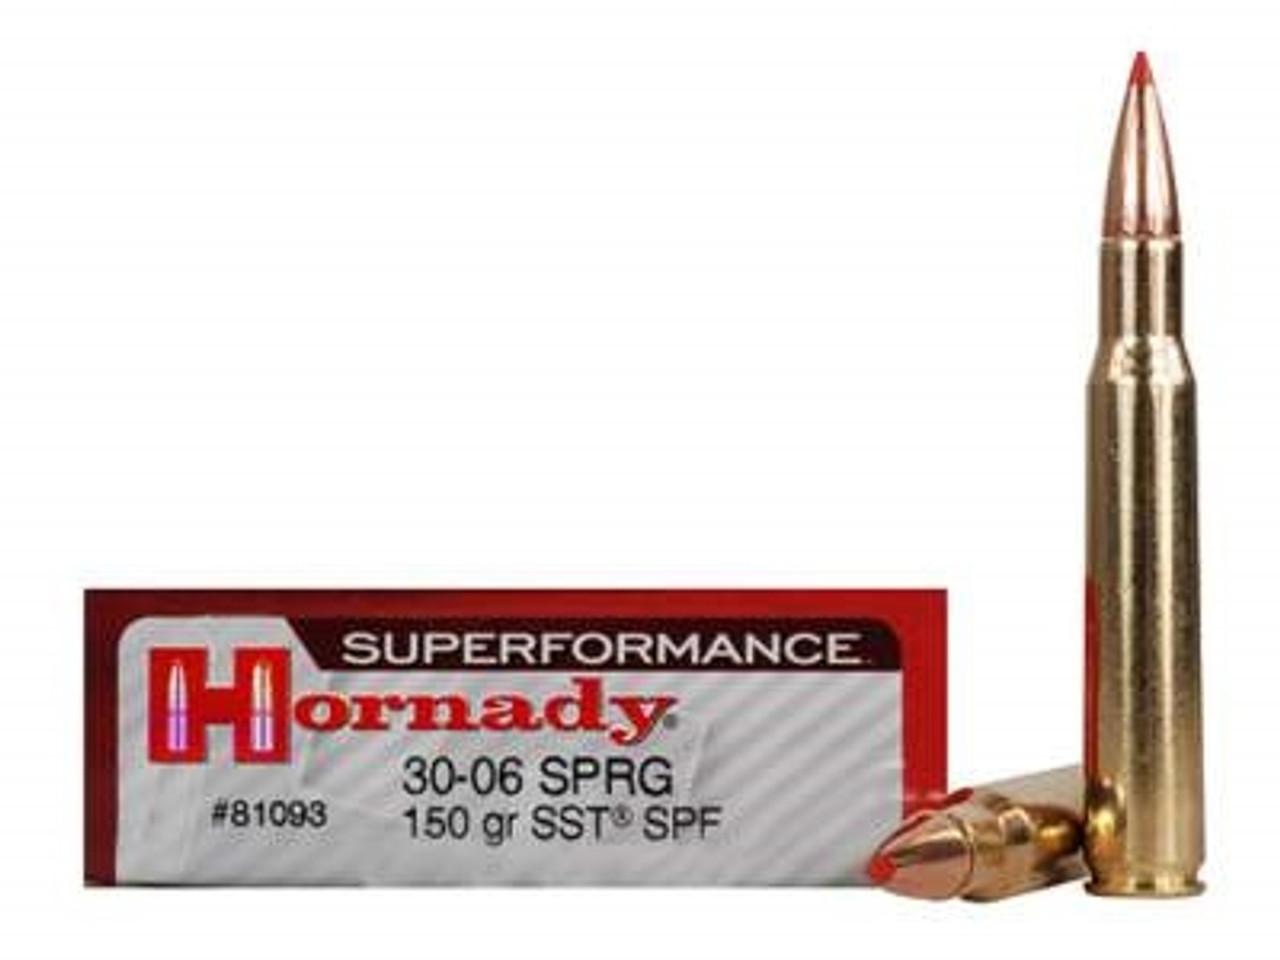 Hornady 30-06 Superformance H81093 150 gr SST 20 rounds